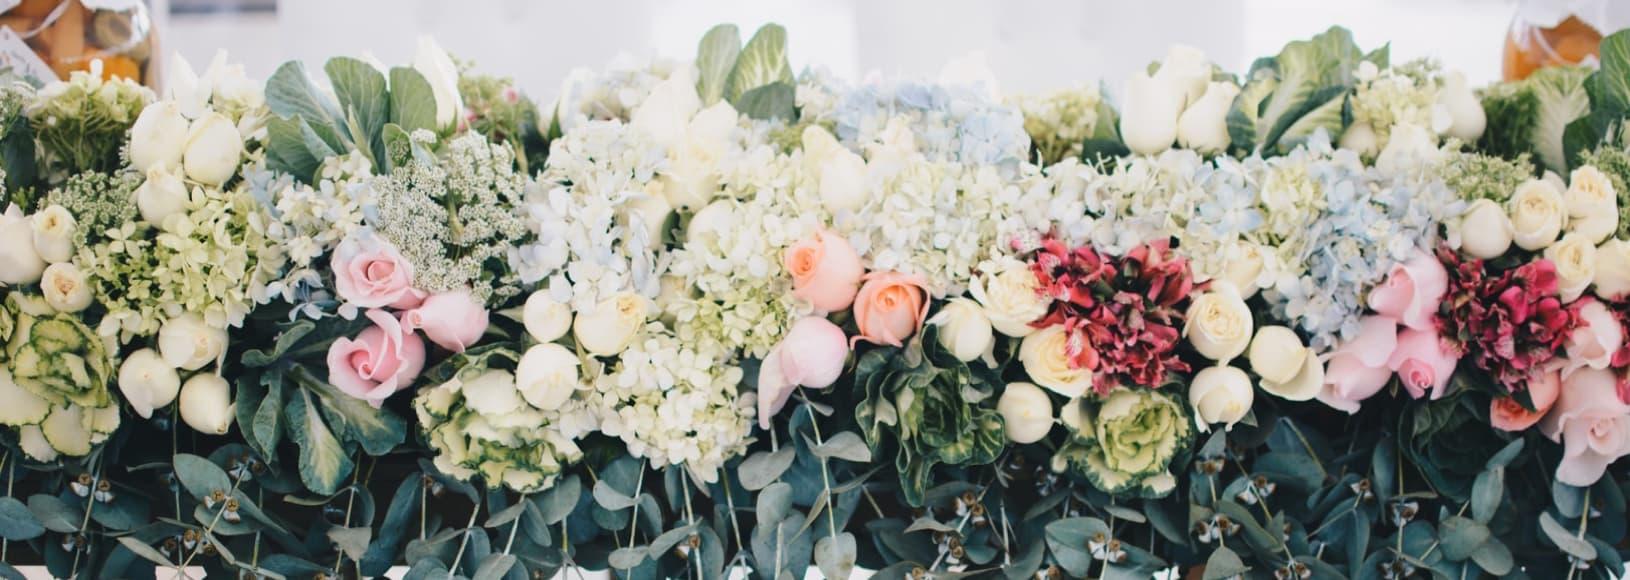 Las mejores floristerías de boda